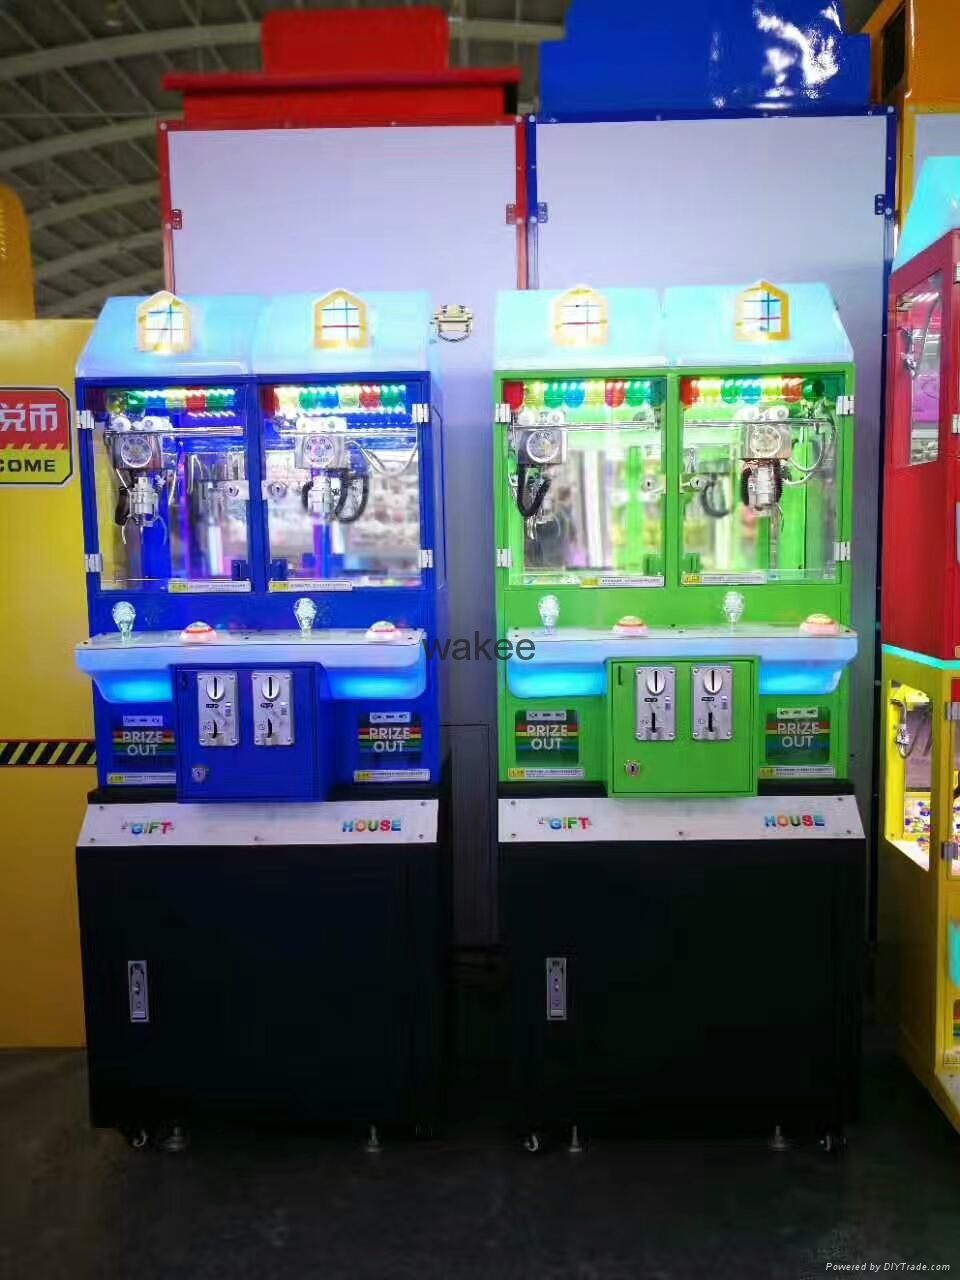 2017 candy slot machine arcade game Magic House doll coin pusher machine for kid 4